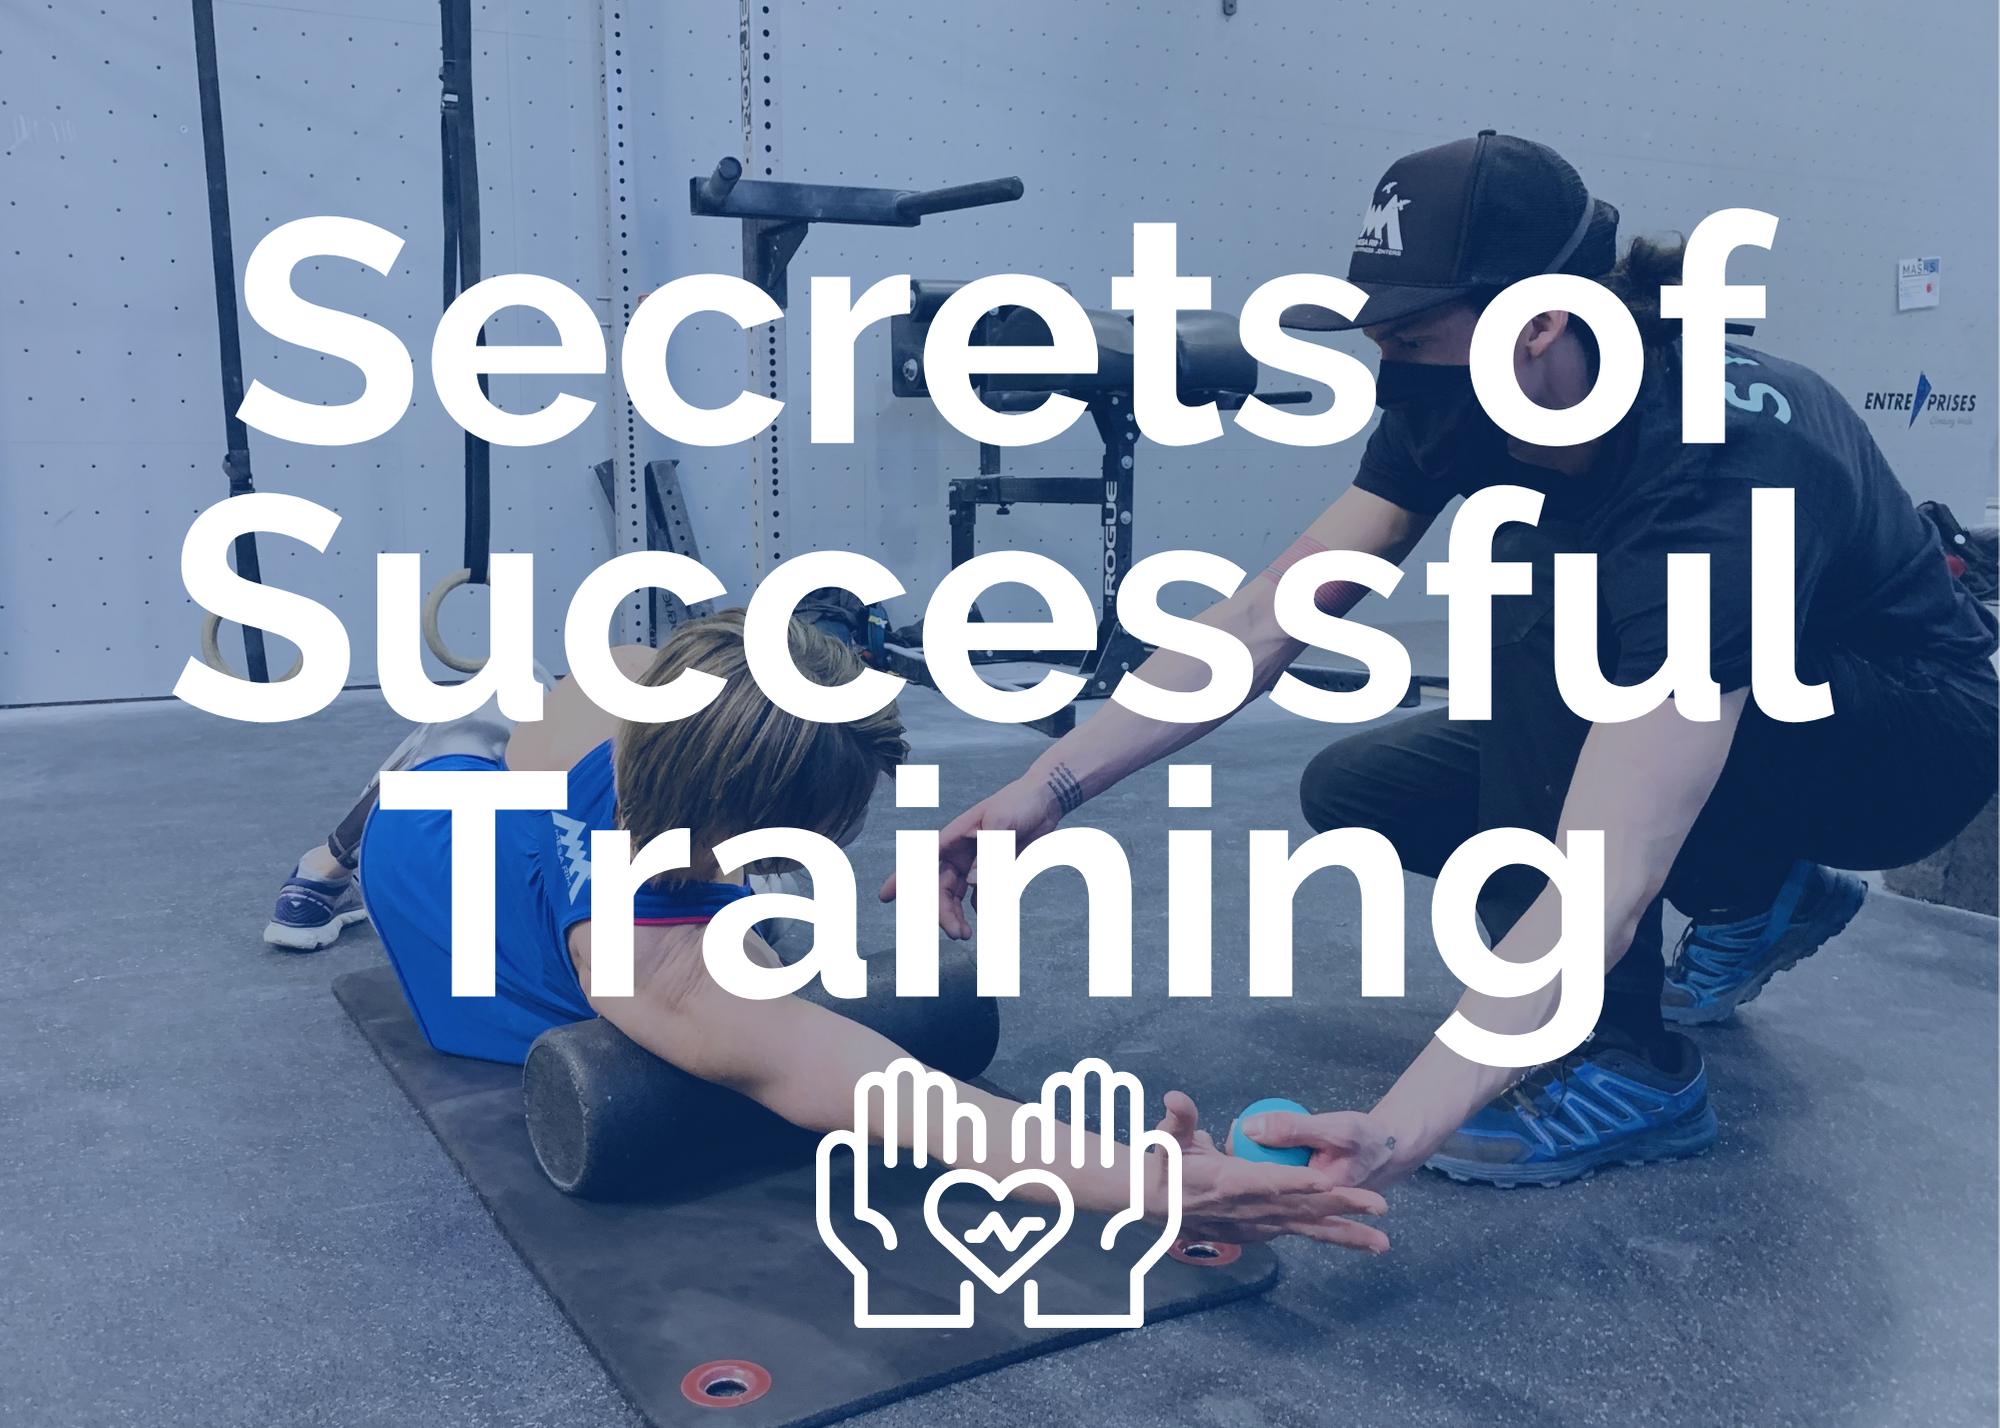 Secrets of Successful Training